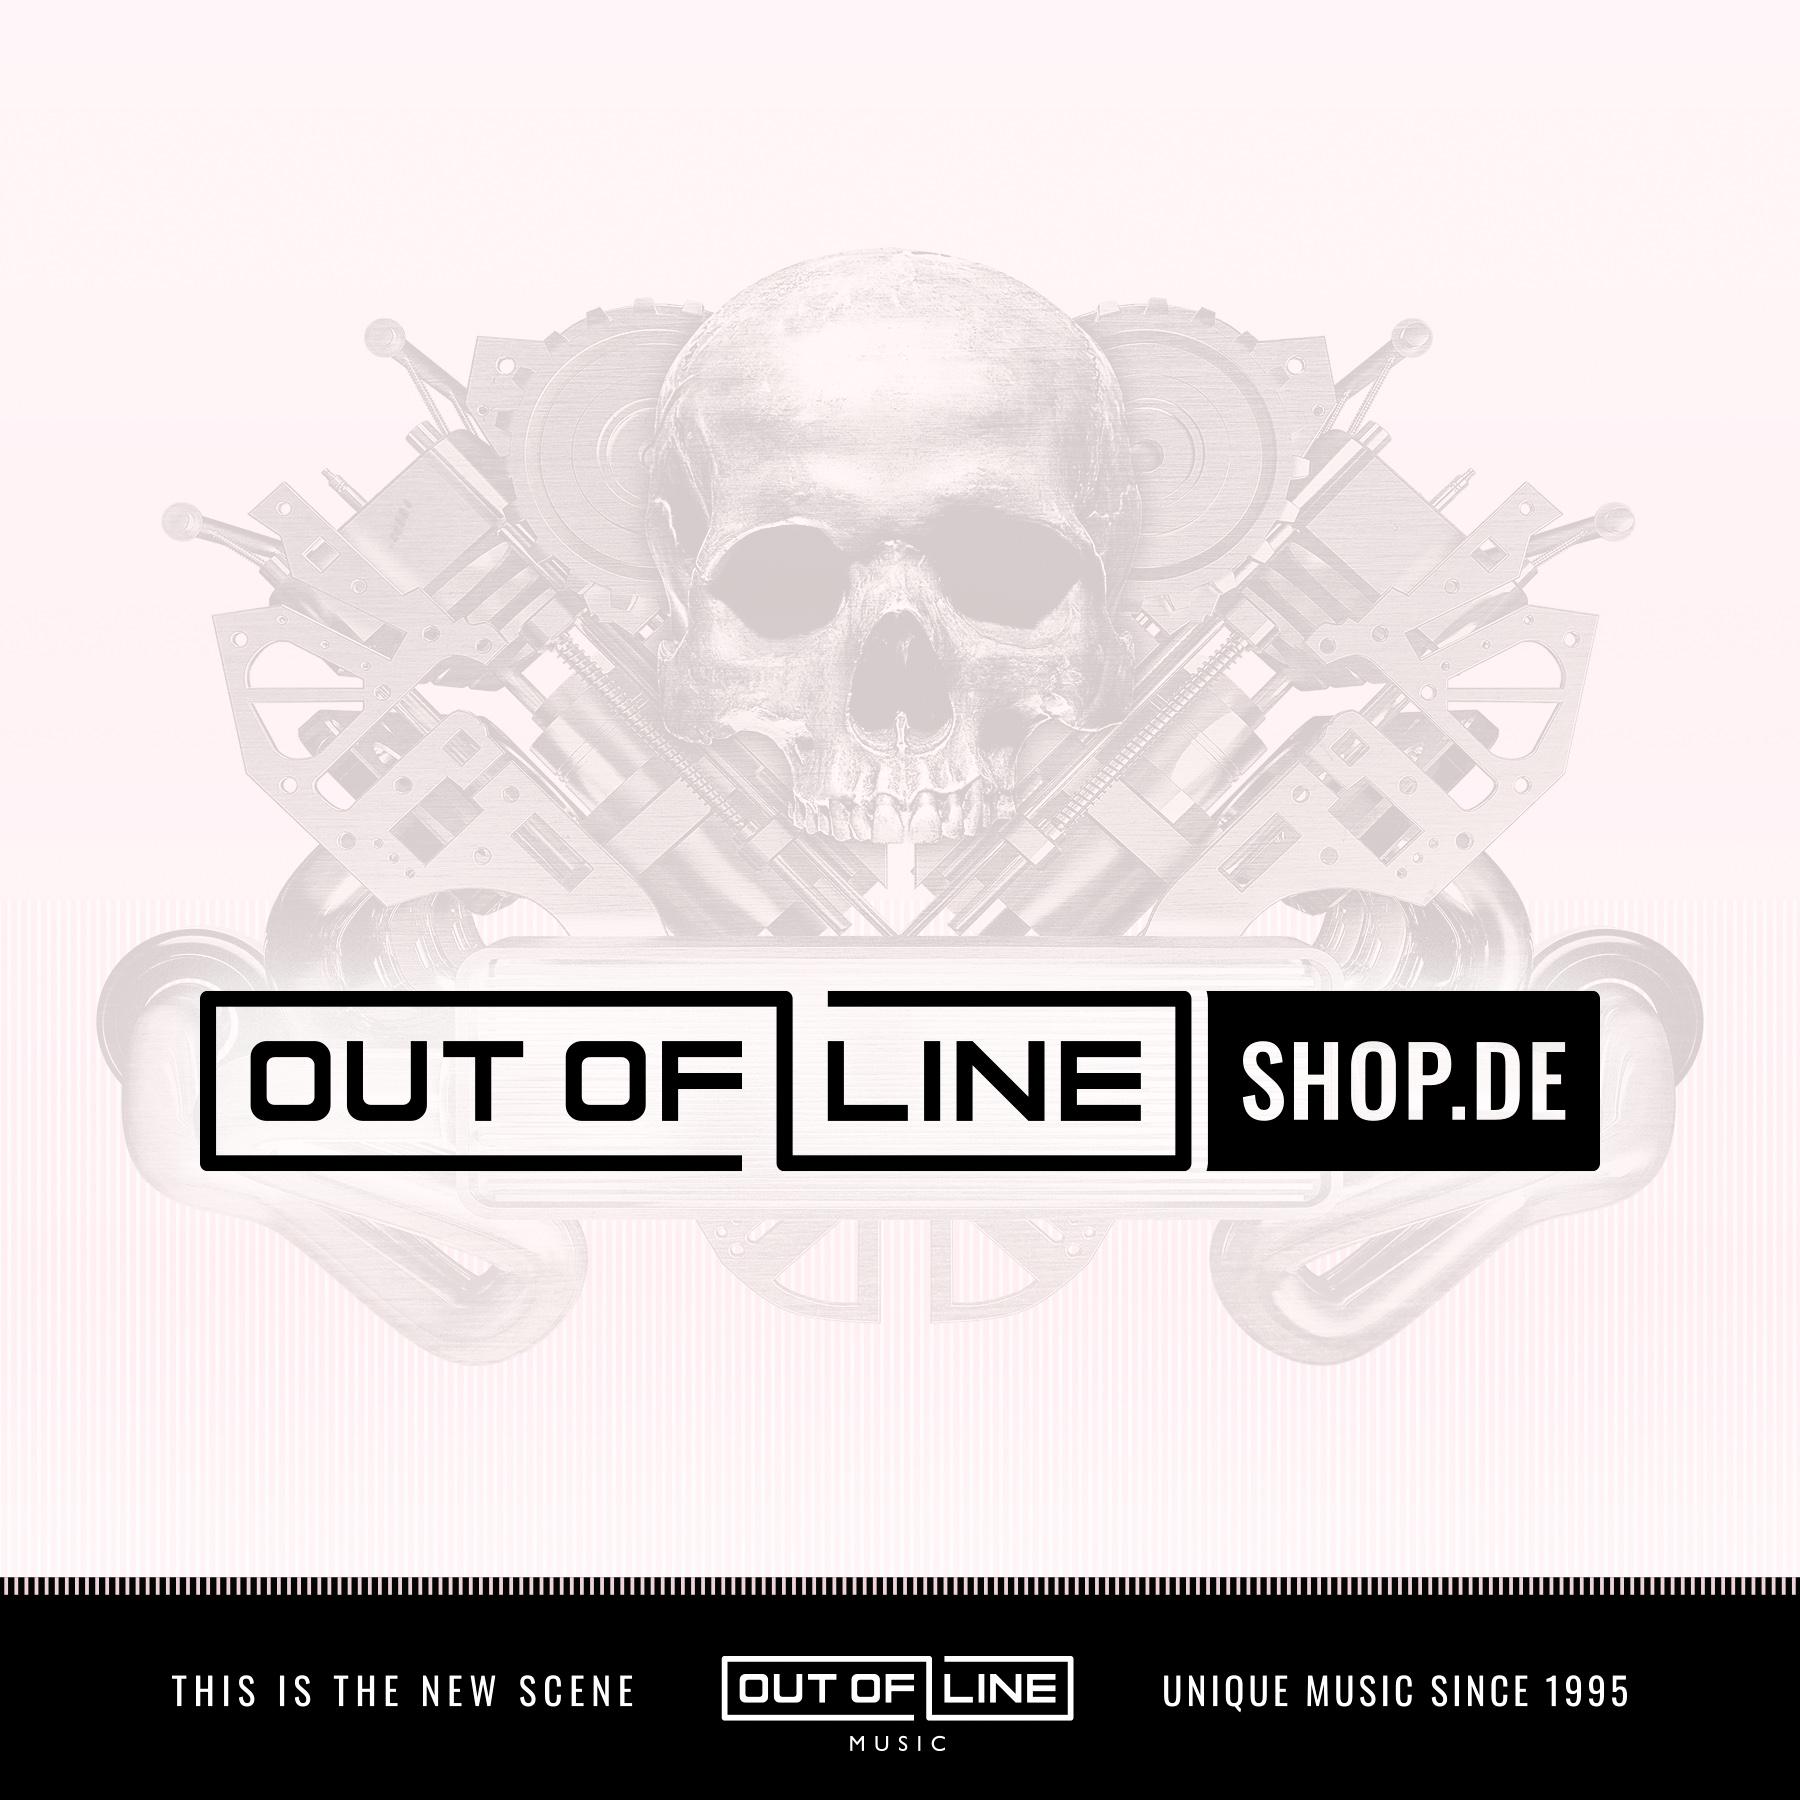 Blutengel - Kalender 2022 (Limited Edition) - Kalender/Calendar